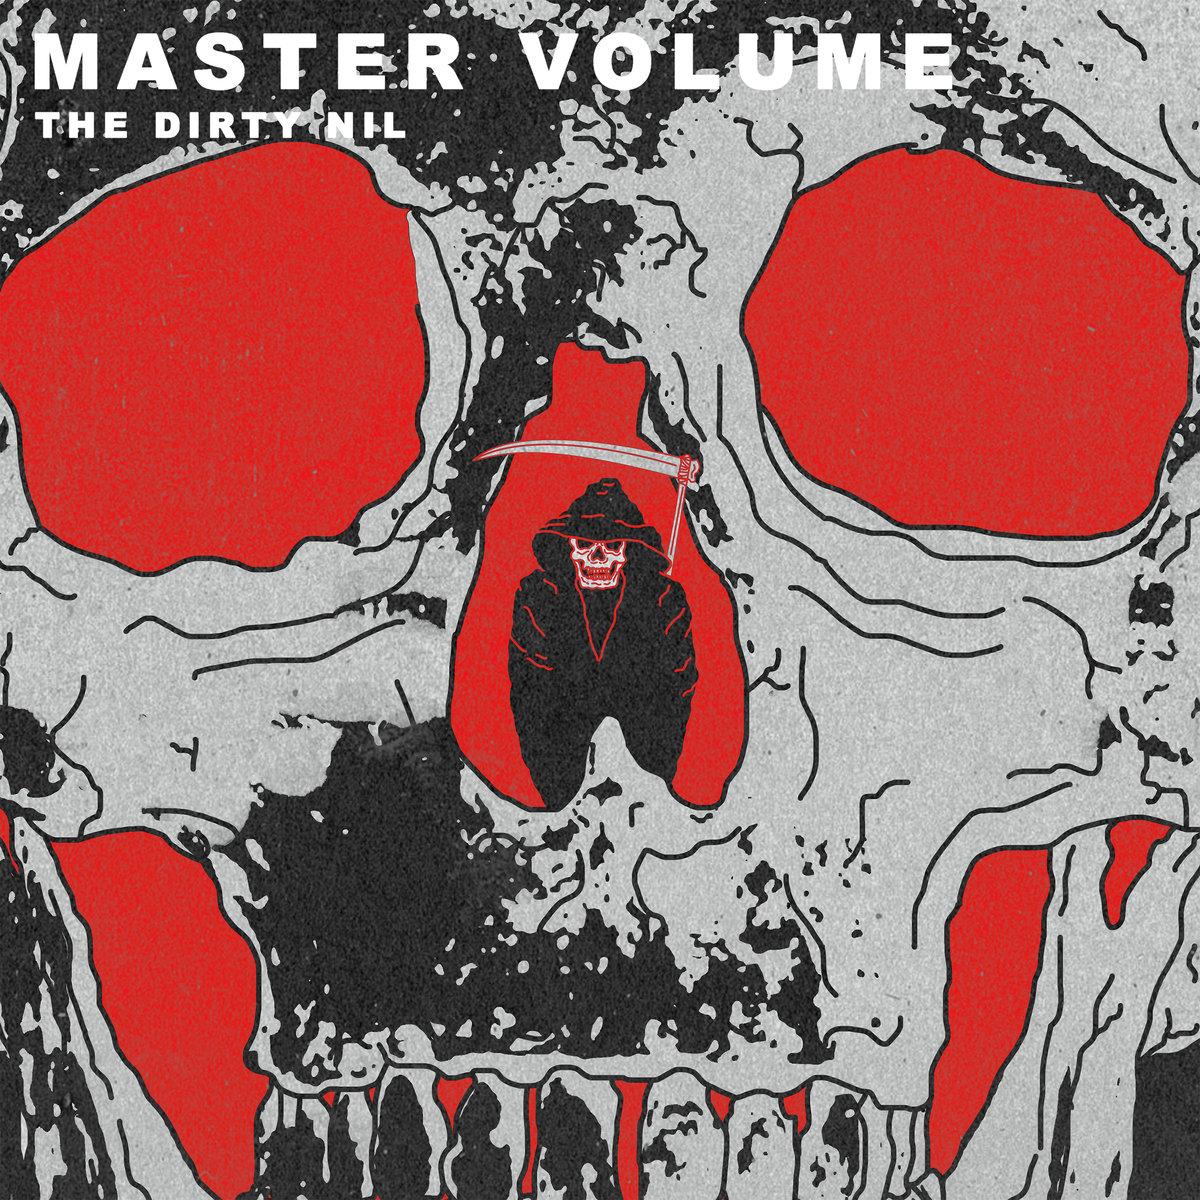 The Dirty Nil - Master Volume LP